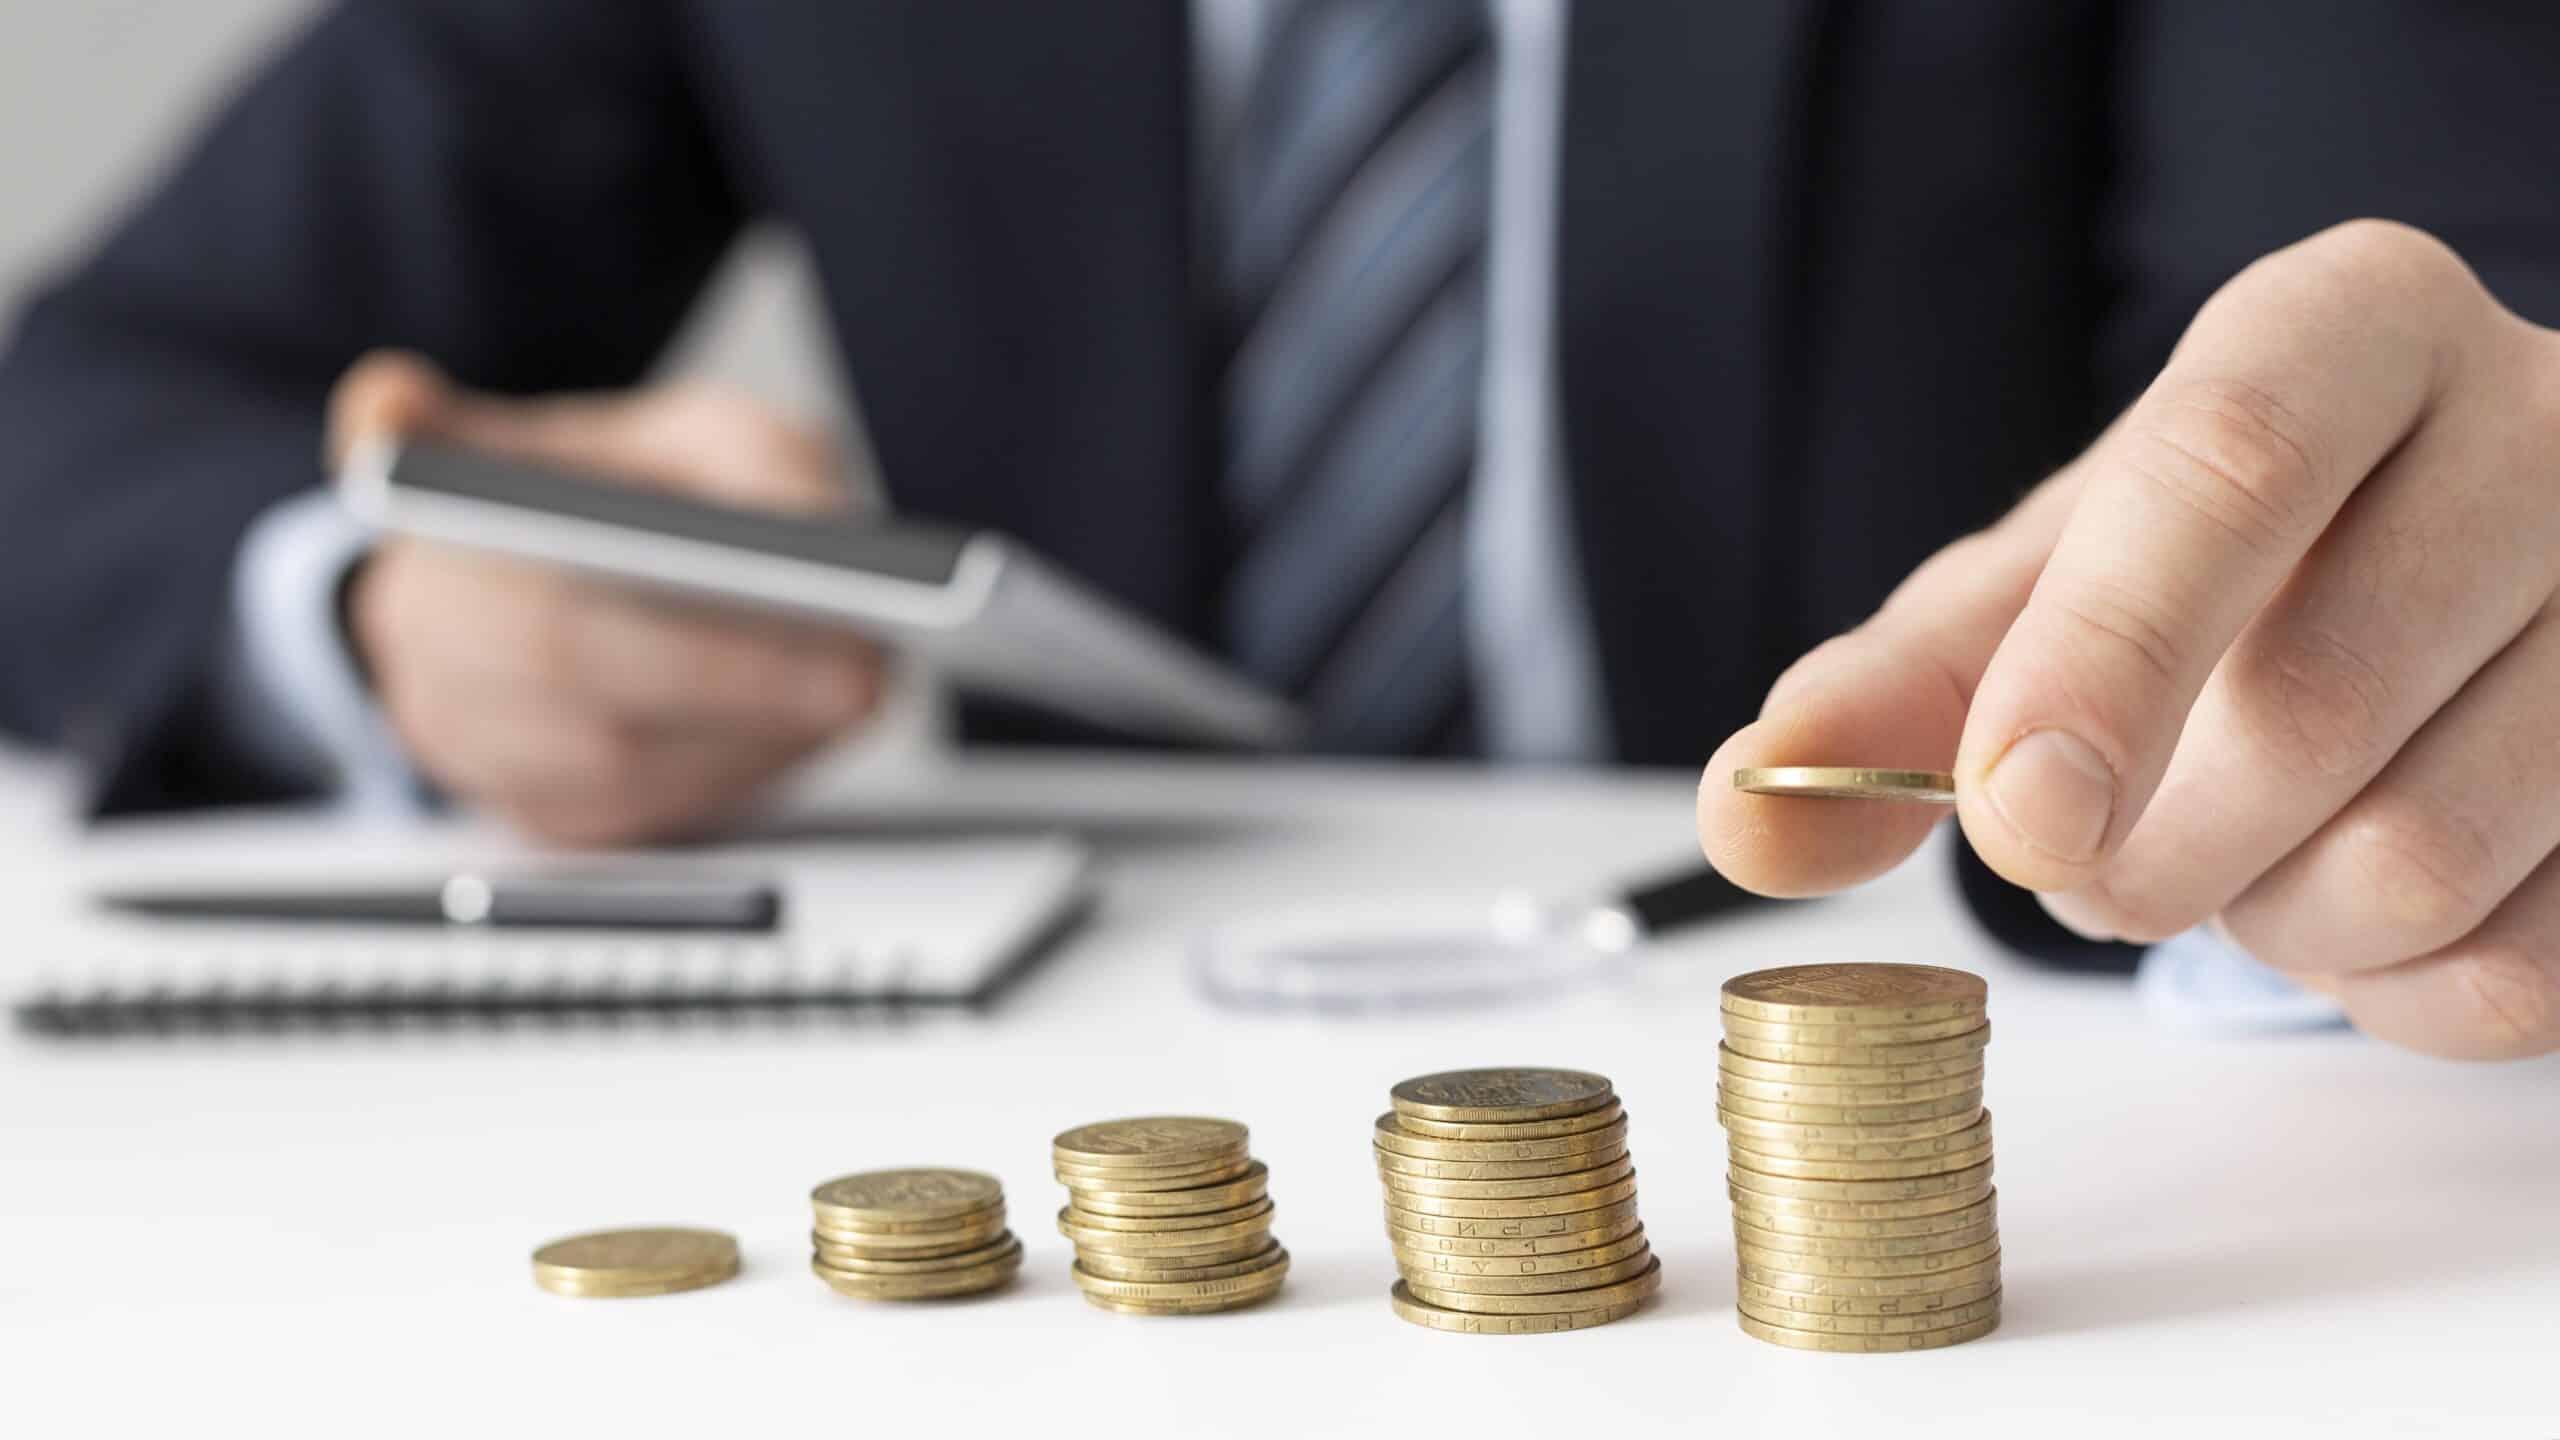 12 months loan lender Singapore